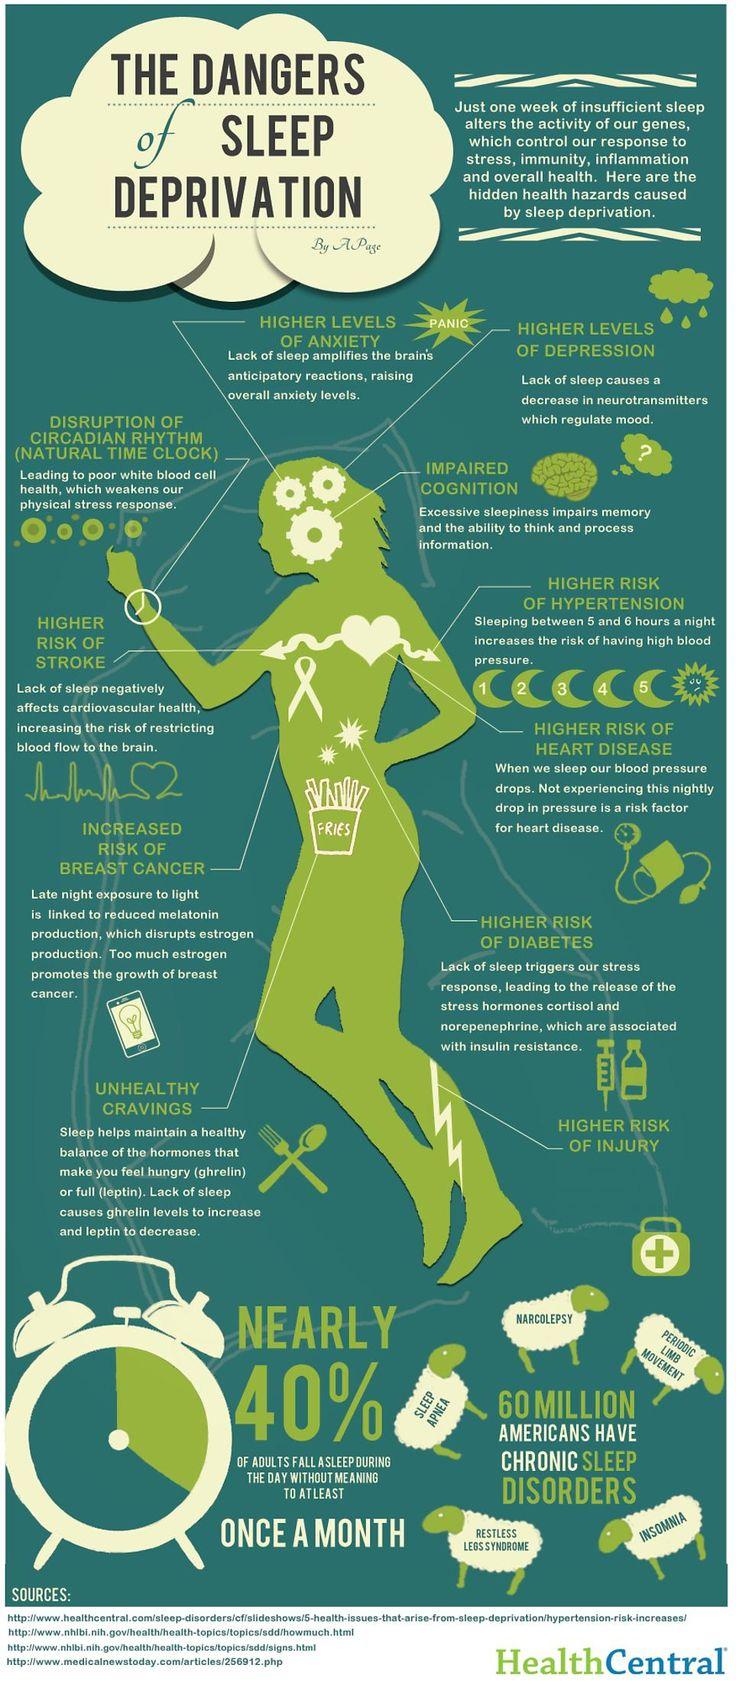 Dangers of sleep deprivation #sleep #success